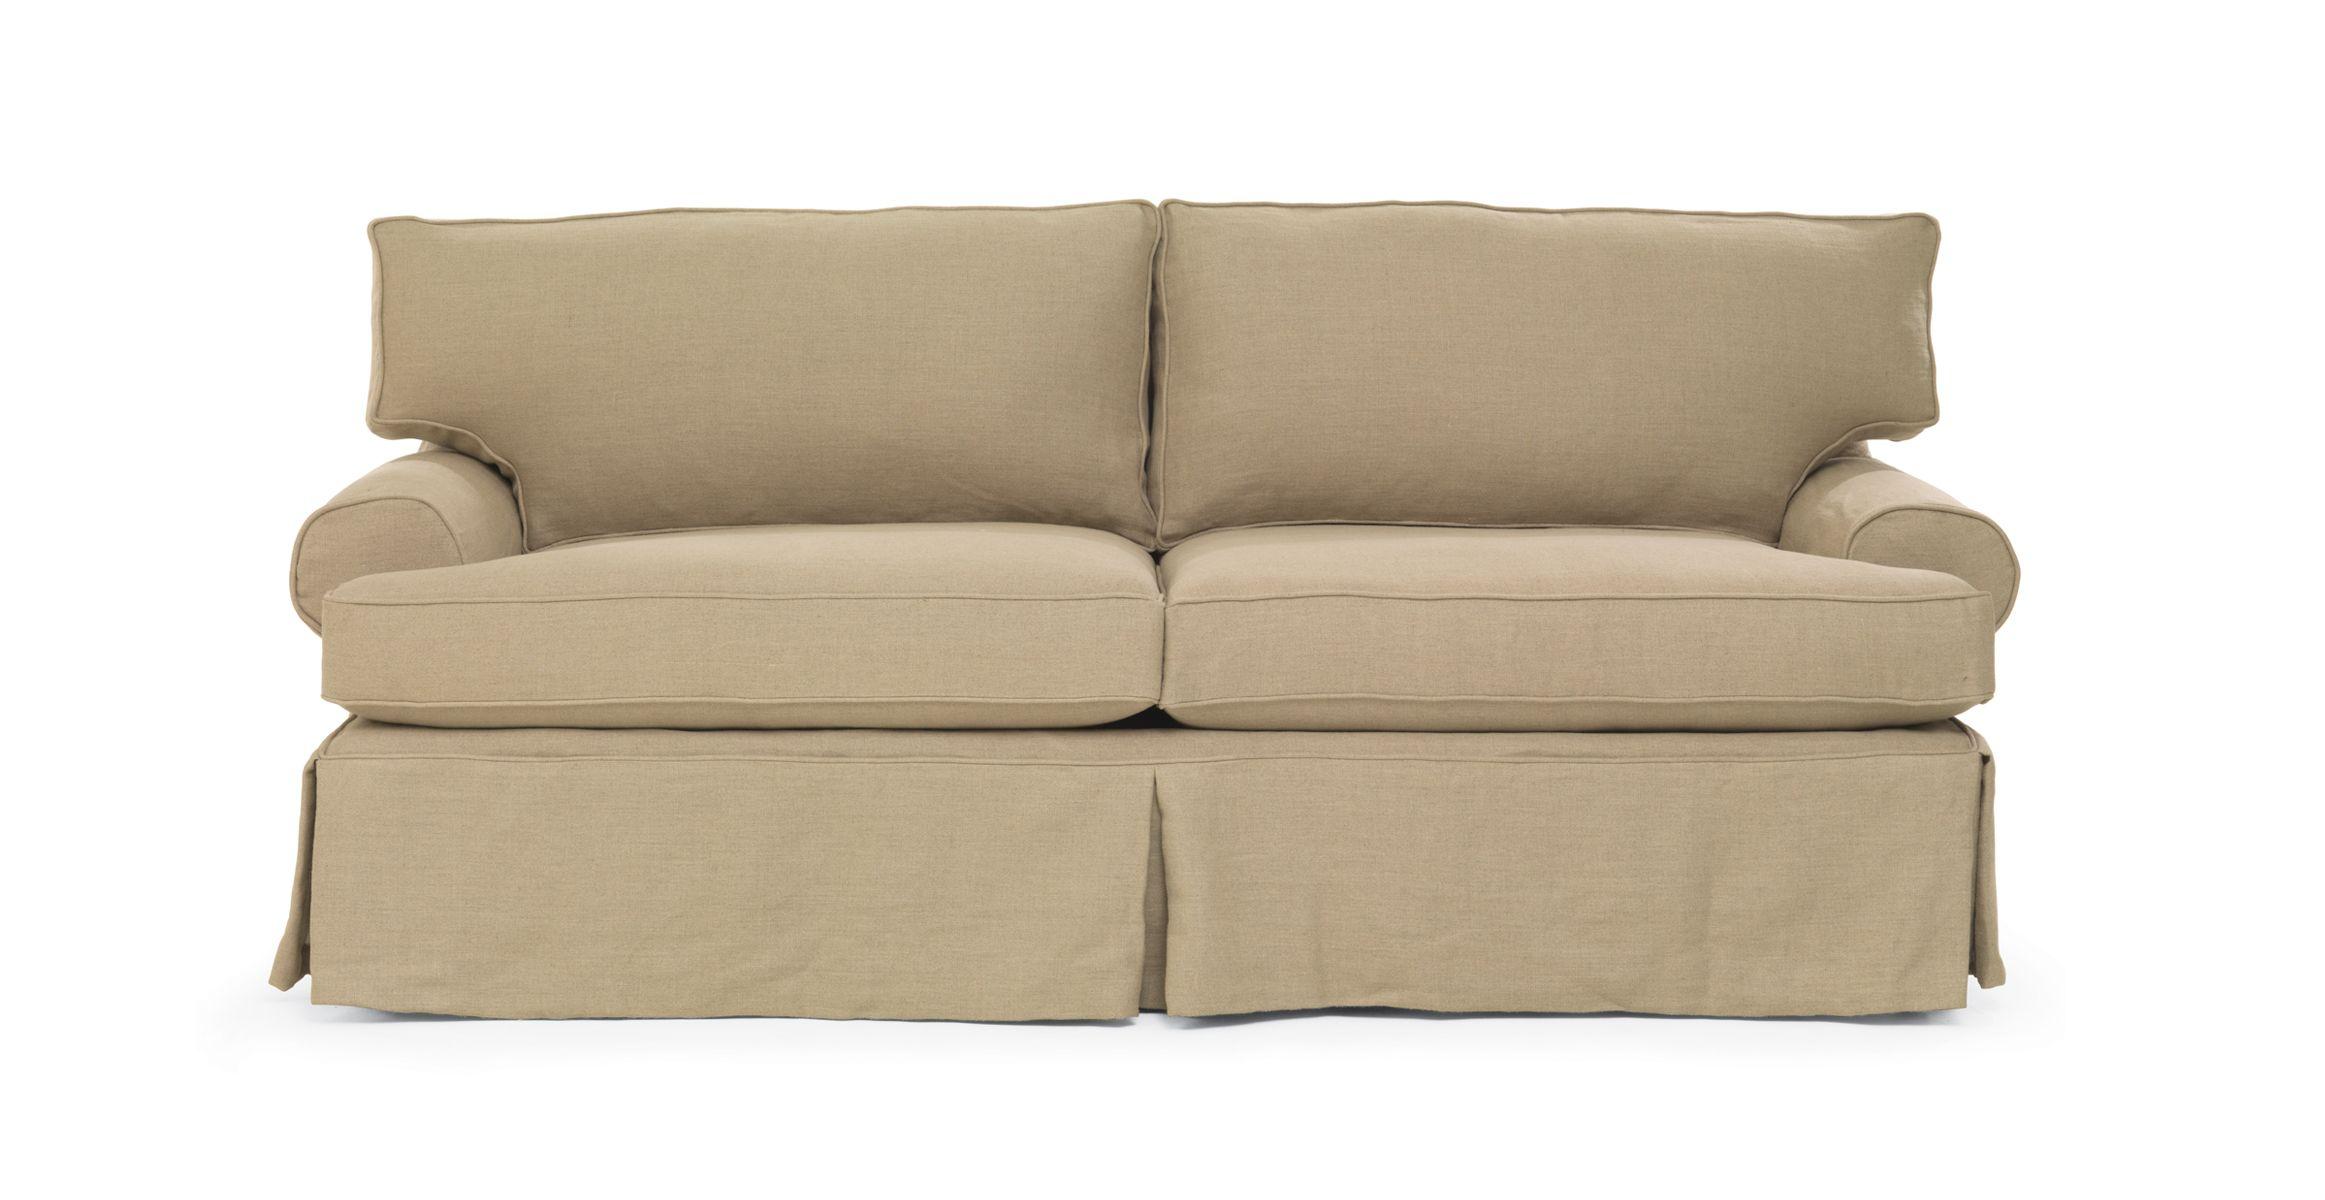 Mitchell Gold Bob Williams Nicki Sofa Slipcovered In Sophie